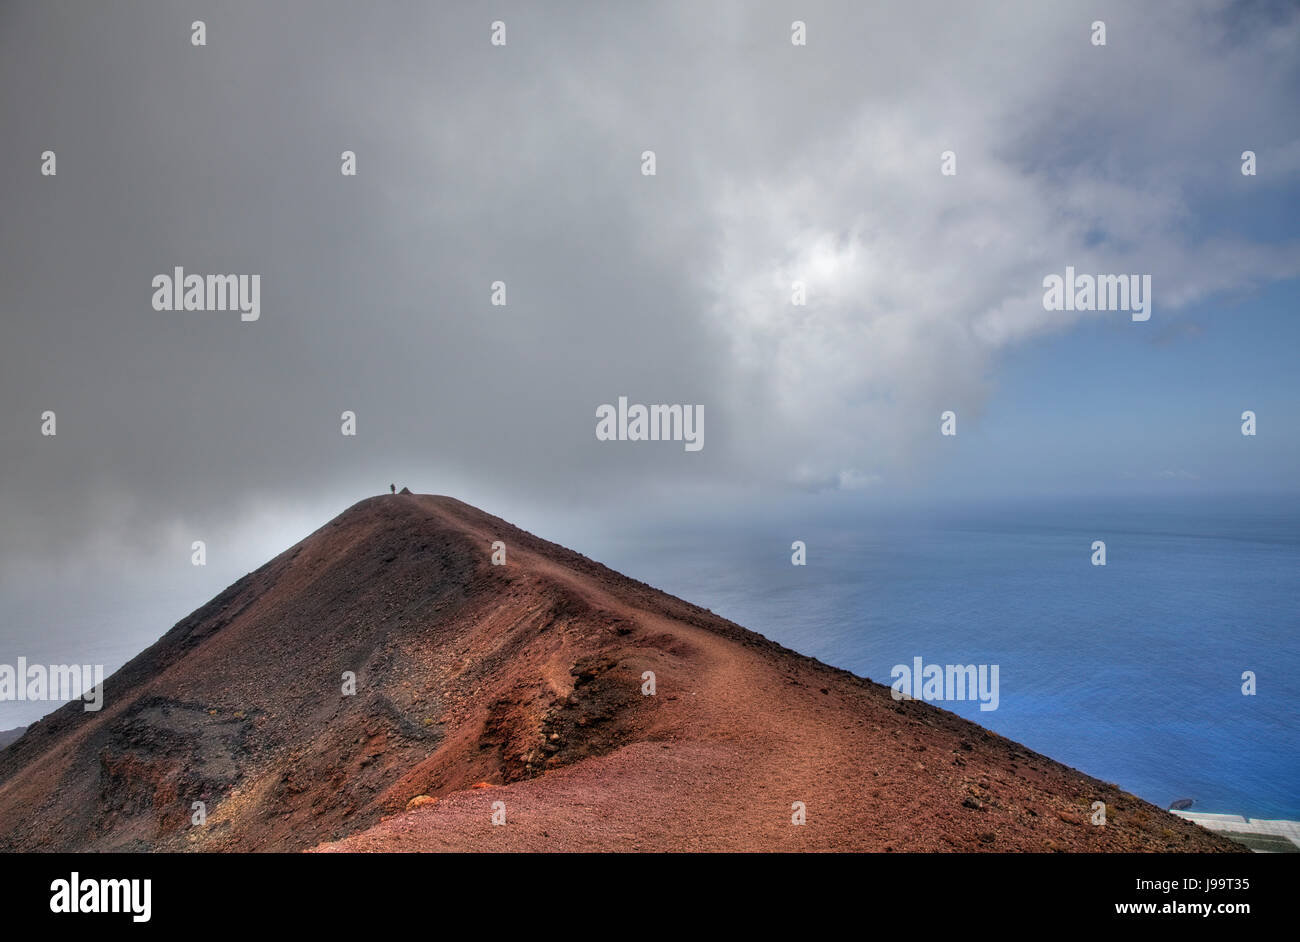 Kanaren, ändern in Wetter, Vulcan, Vulkan, Wolken, Kanaren, blau, Stockbild